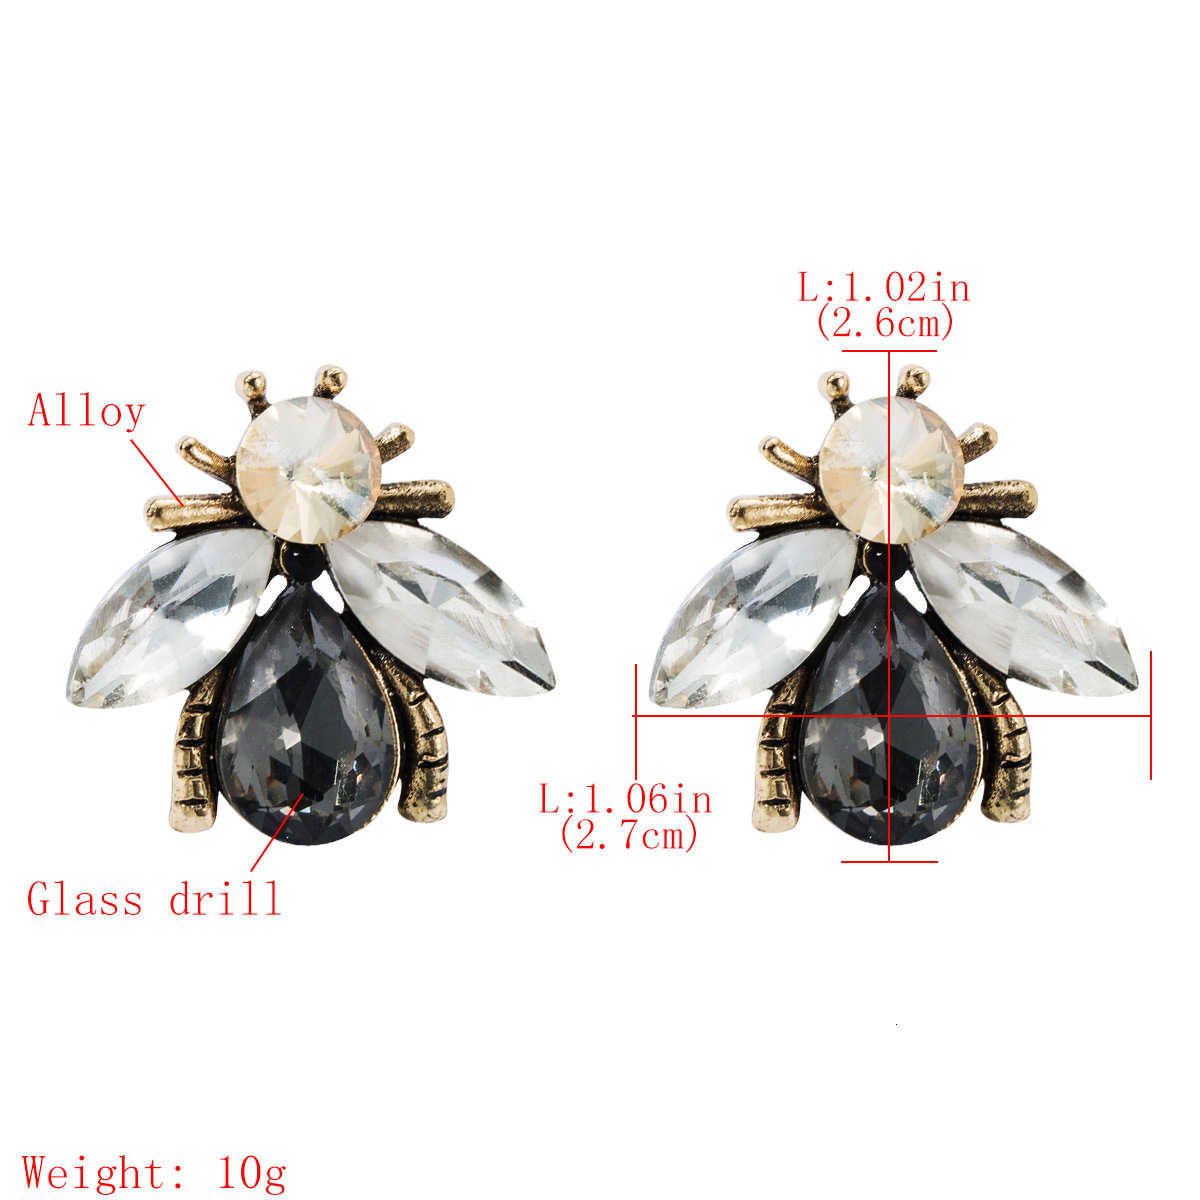 Jouval Kecil Cute Kristal Bee Serangga Stud Anting-Anting untuk Wanita Punk Vintage Pernikahan Anting-Anting Fashion Wanita Brinco Gadis Telinga Perhiasan